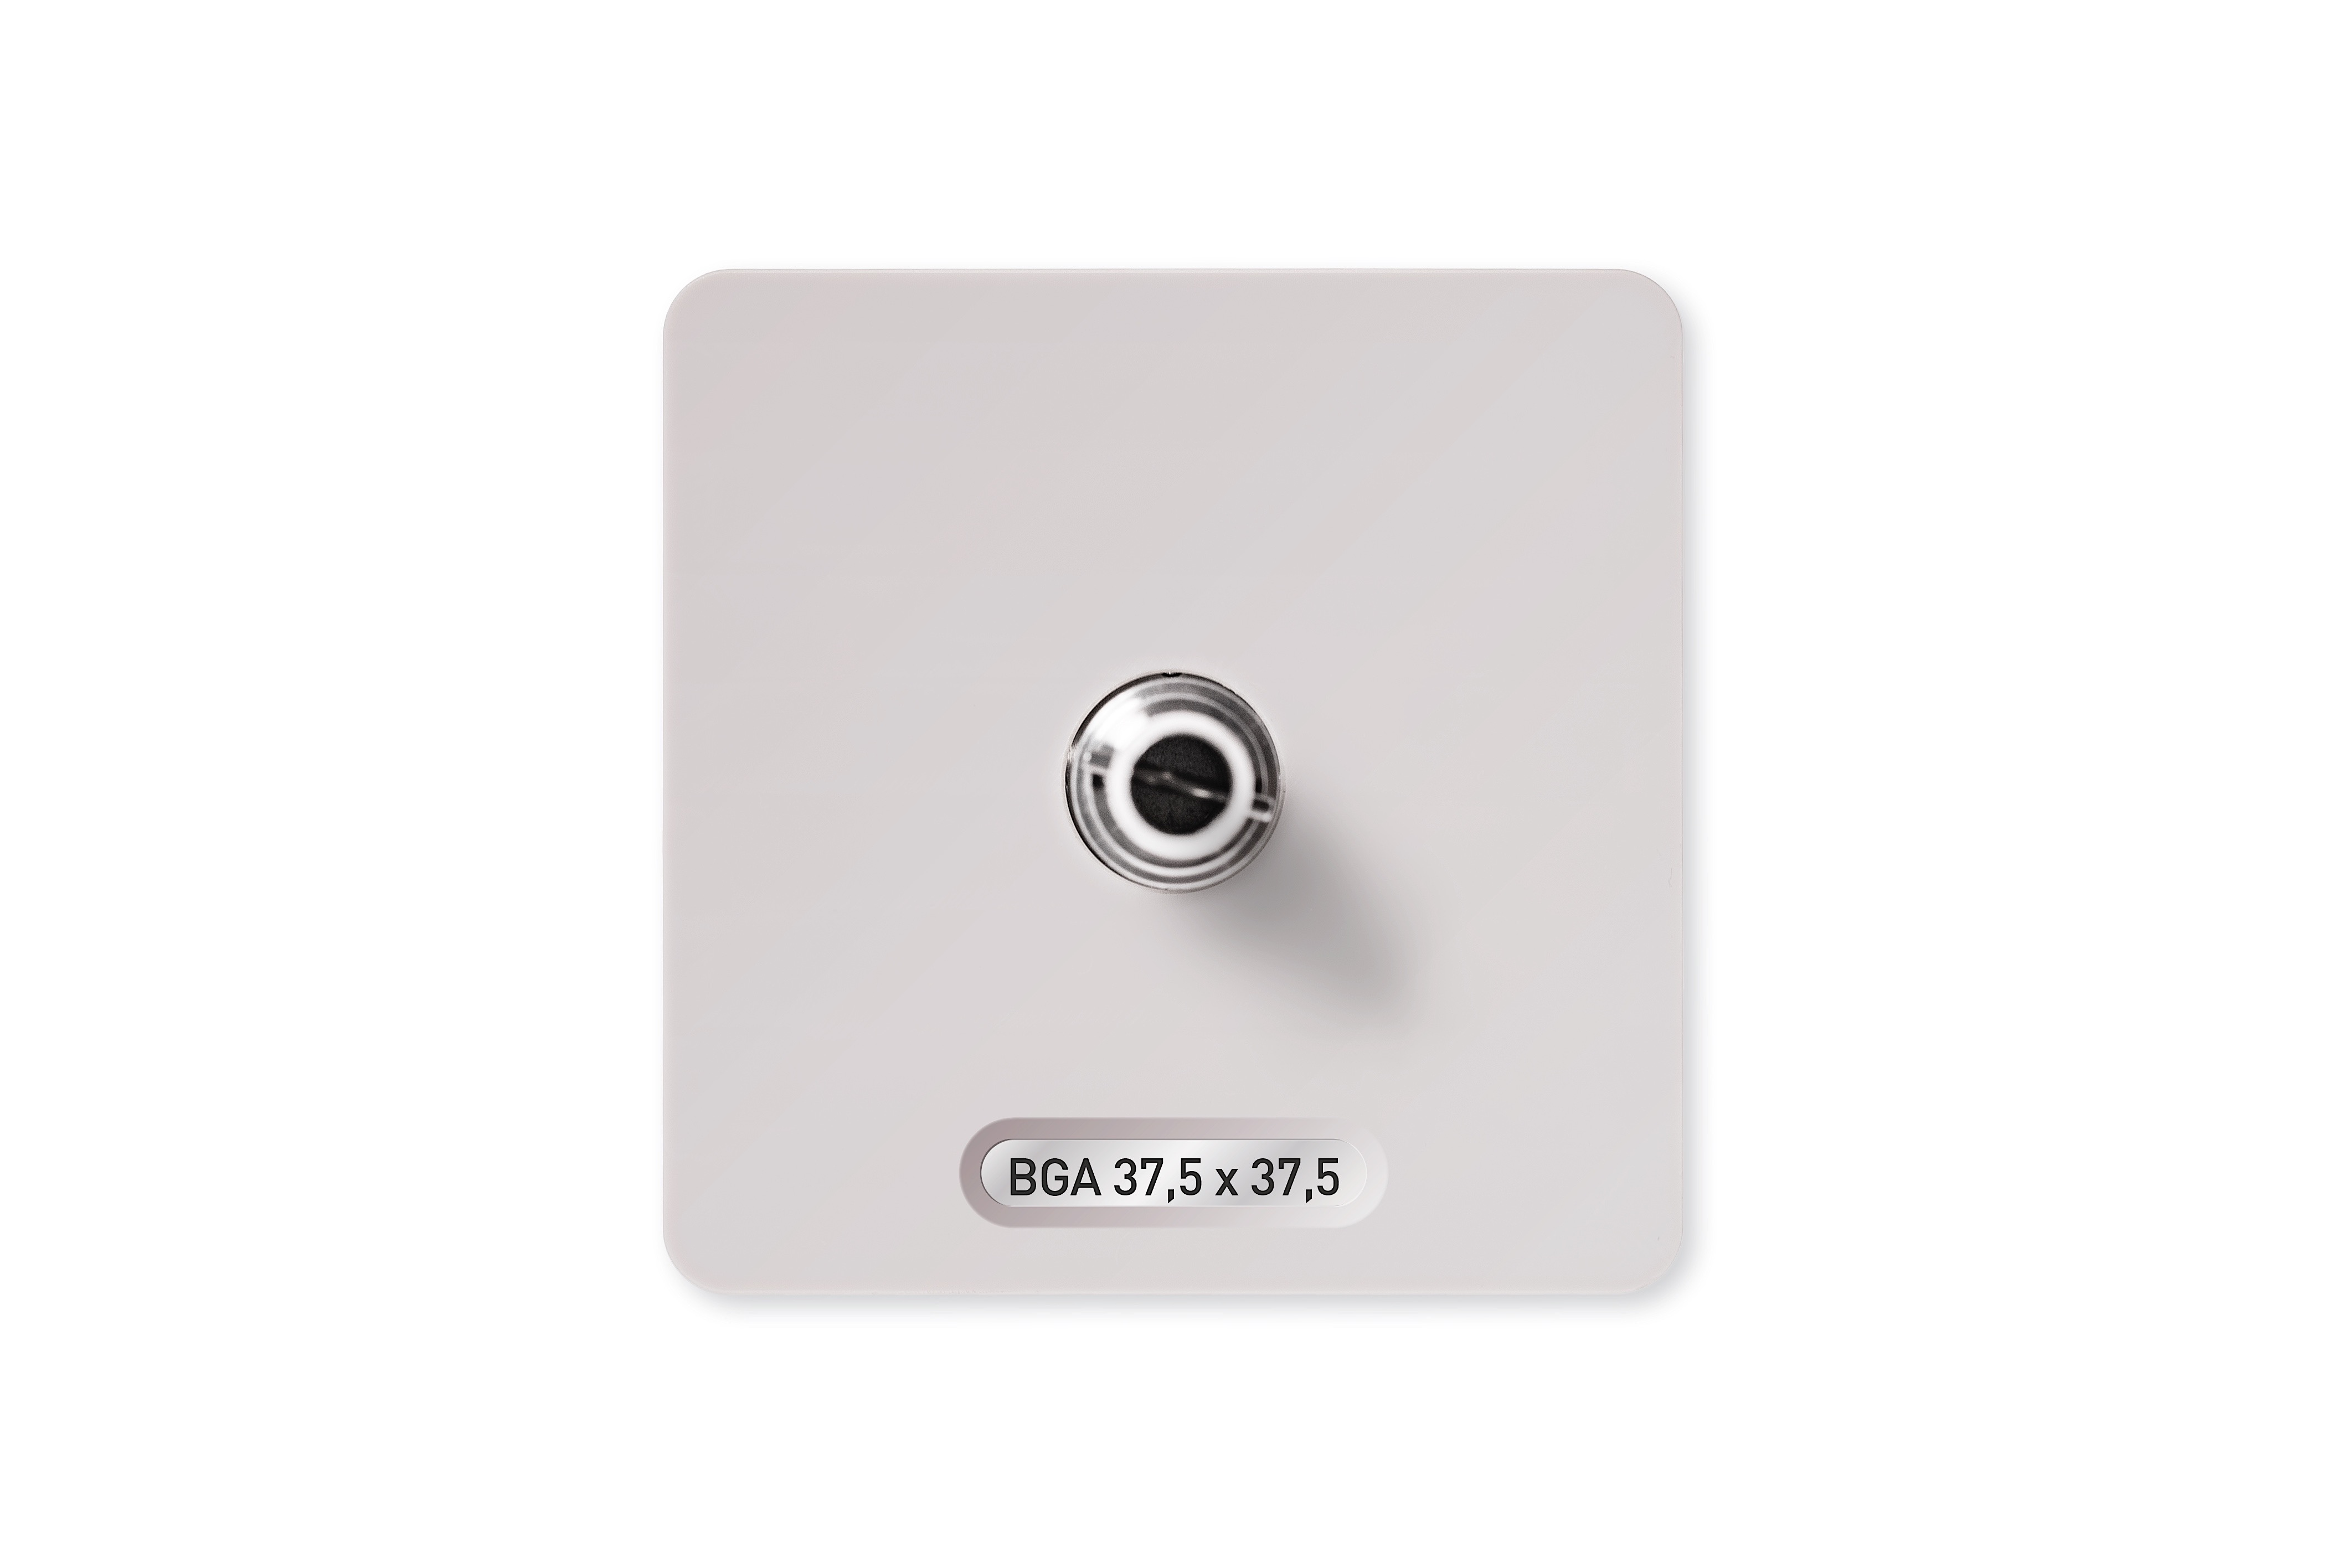 Löt-Werkzeug BGA 37,5*37,5mm